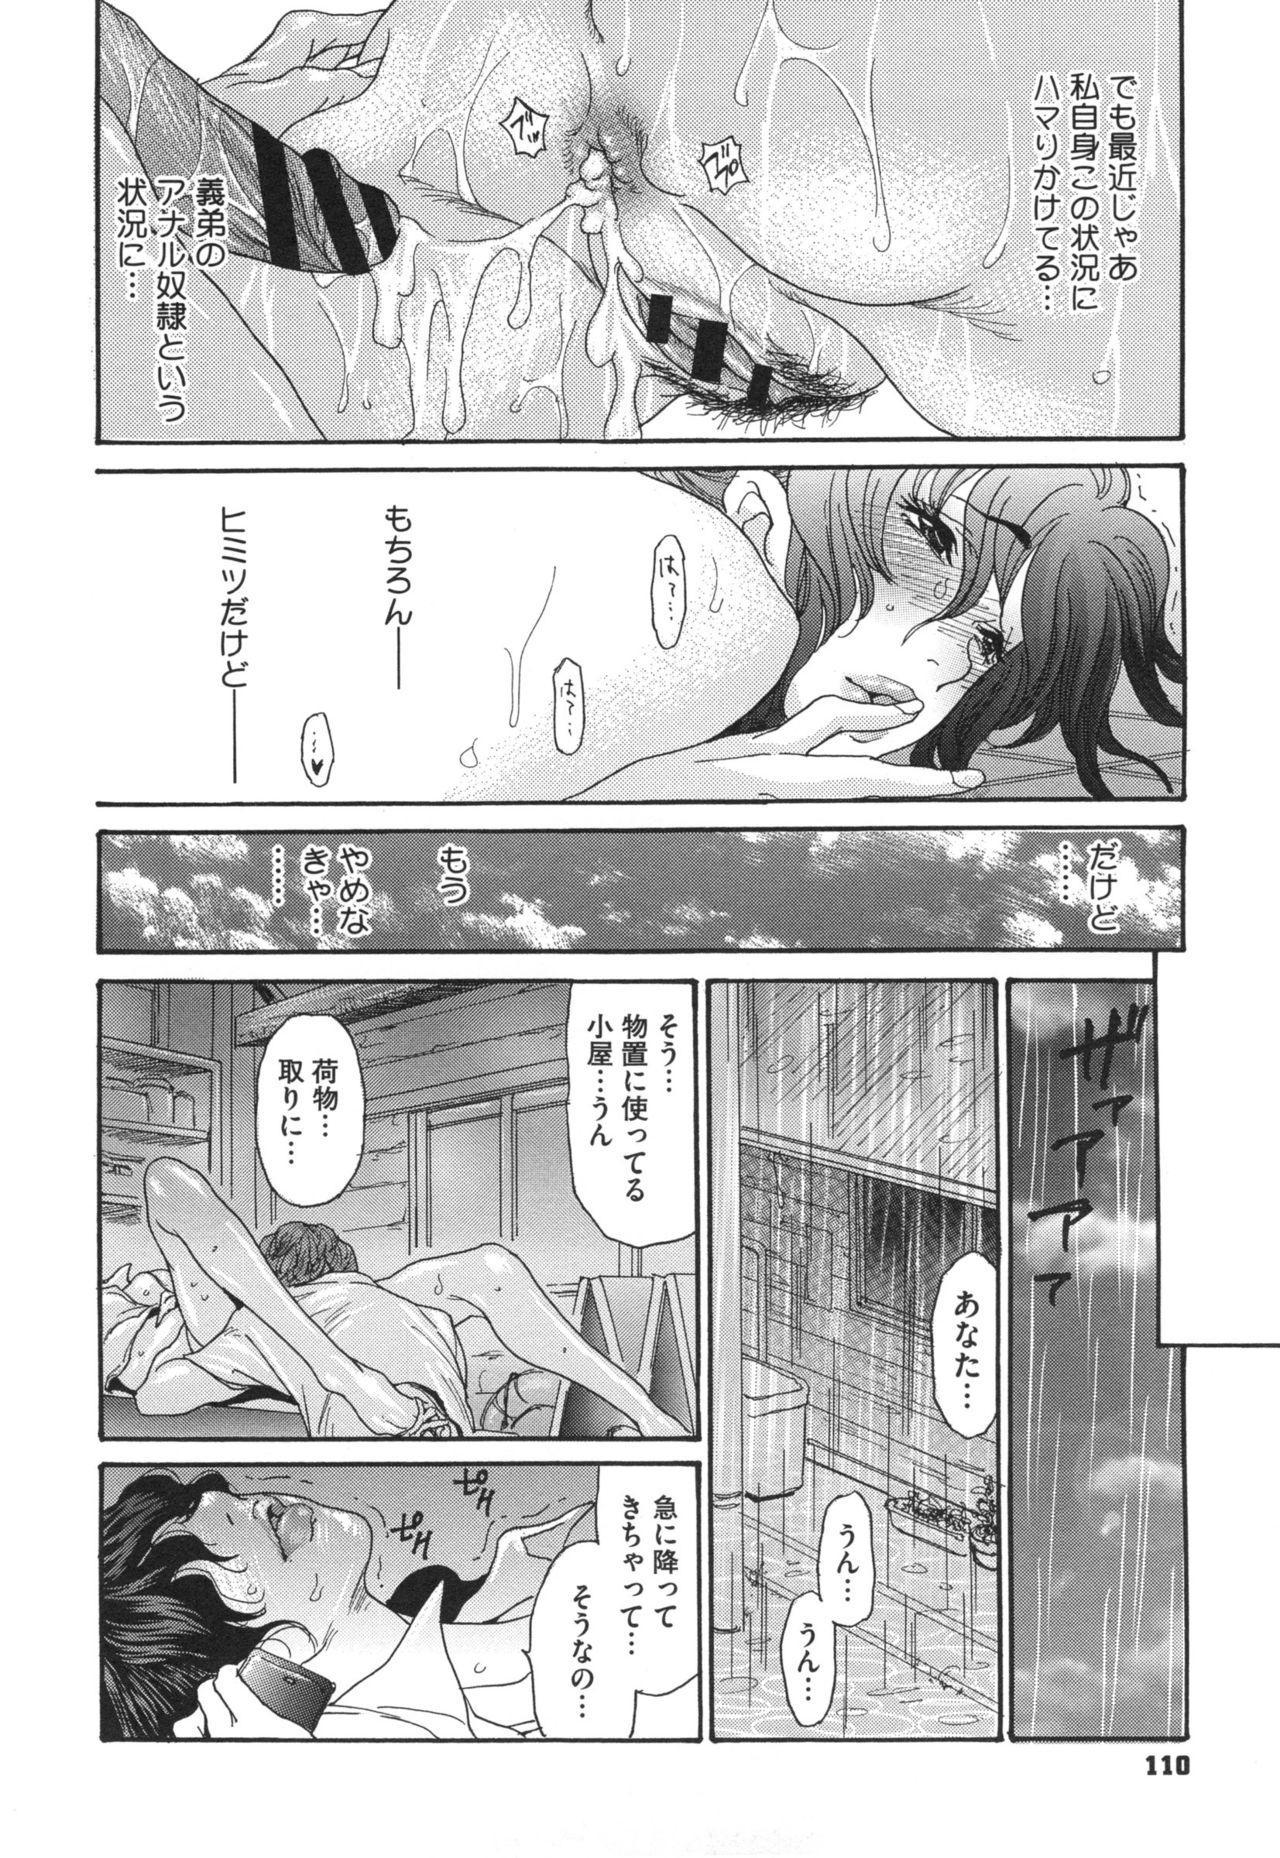 Niku-zuma Netorare Maniacs 112